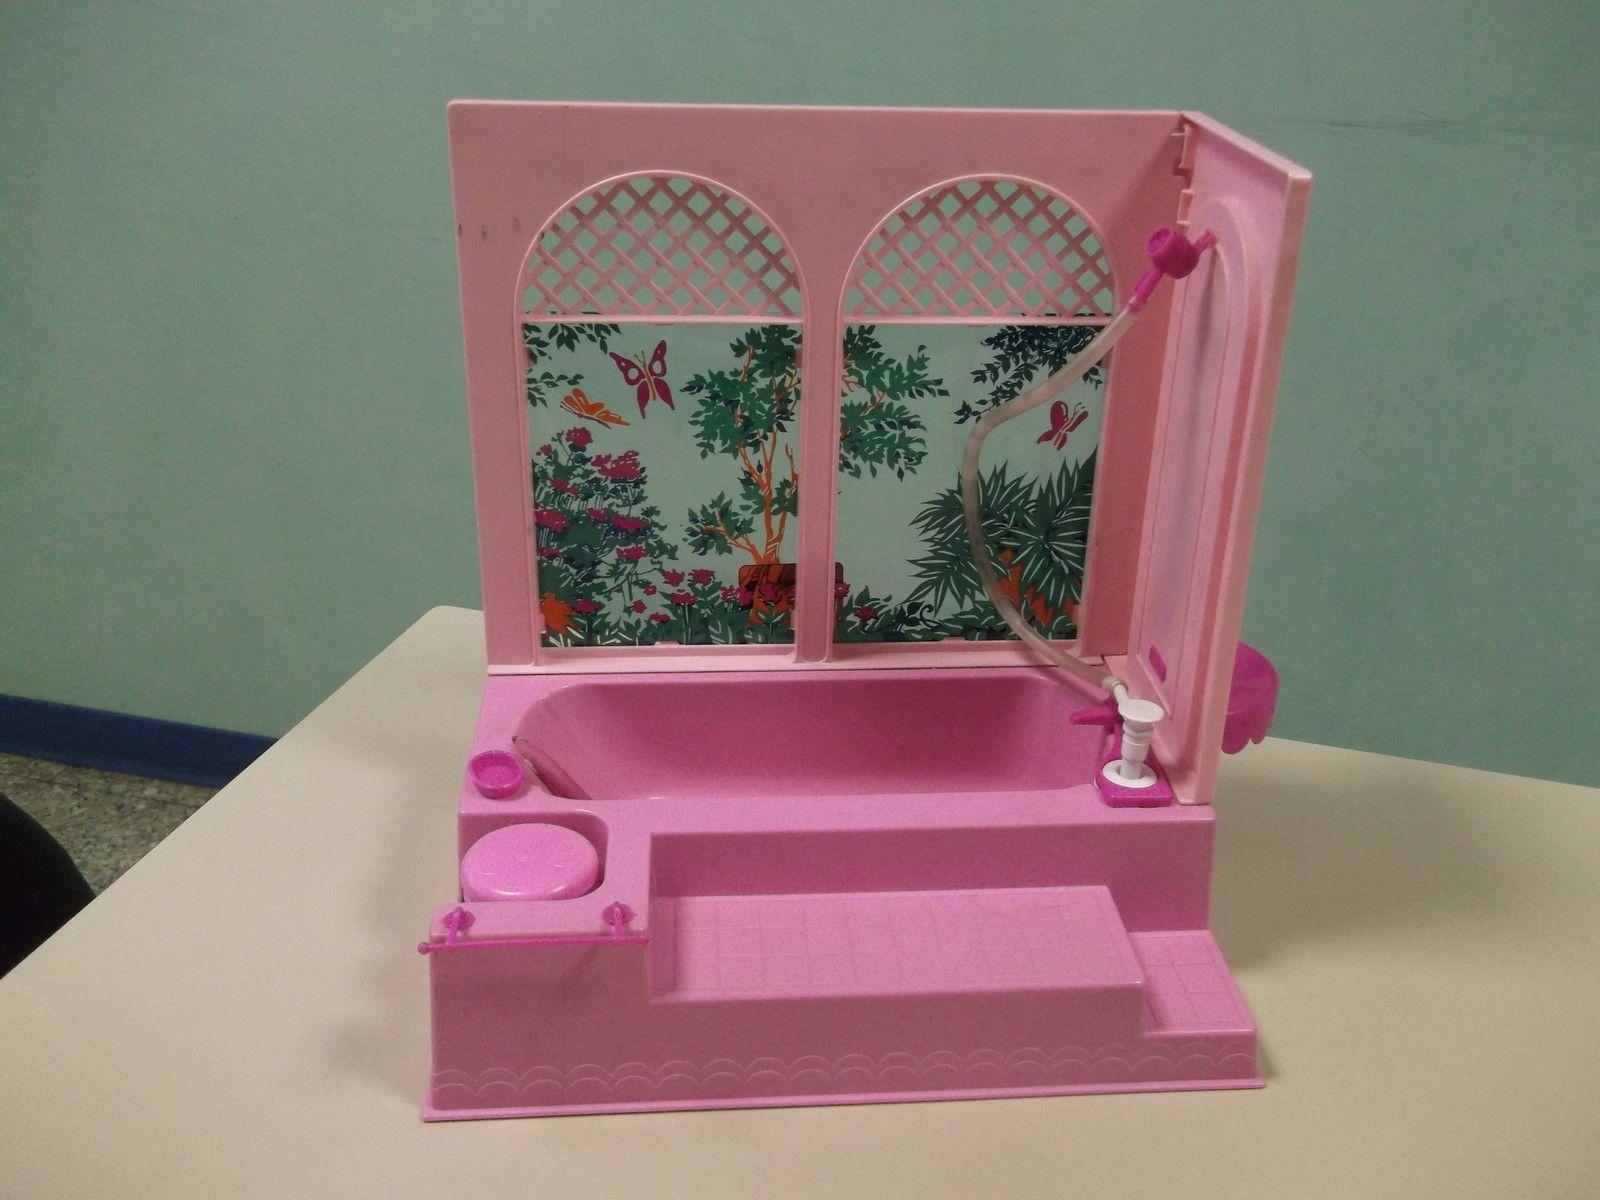 Vasca Da Bagno Barbie Anni 70 : Bagno barbie mattel vintage originale anni ebay anni